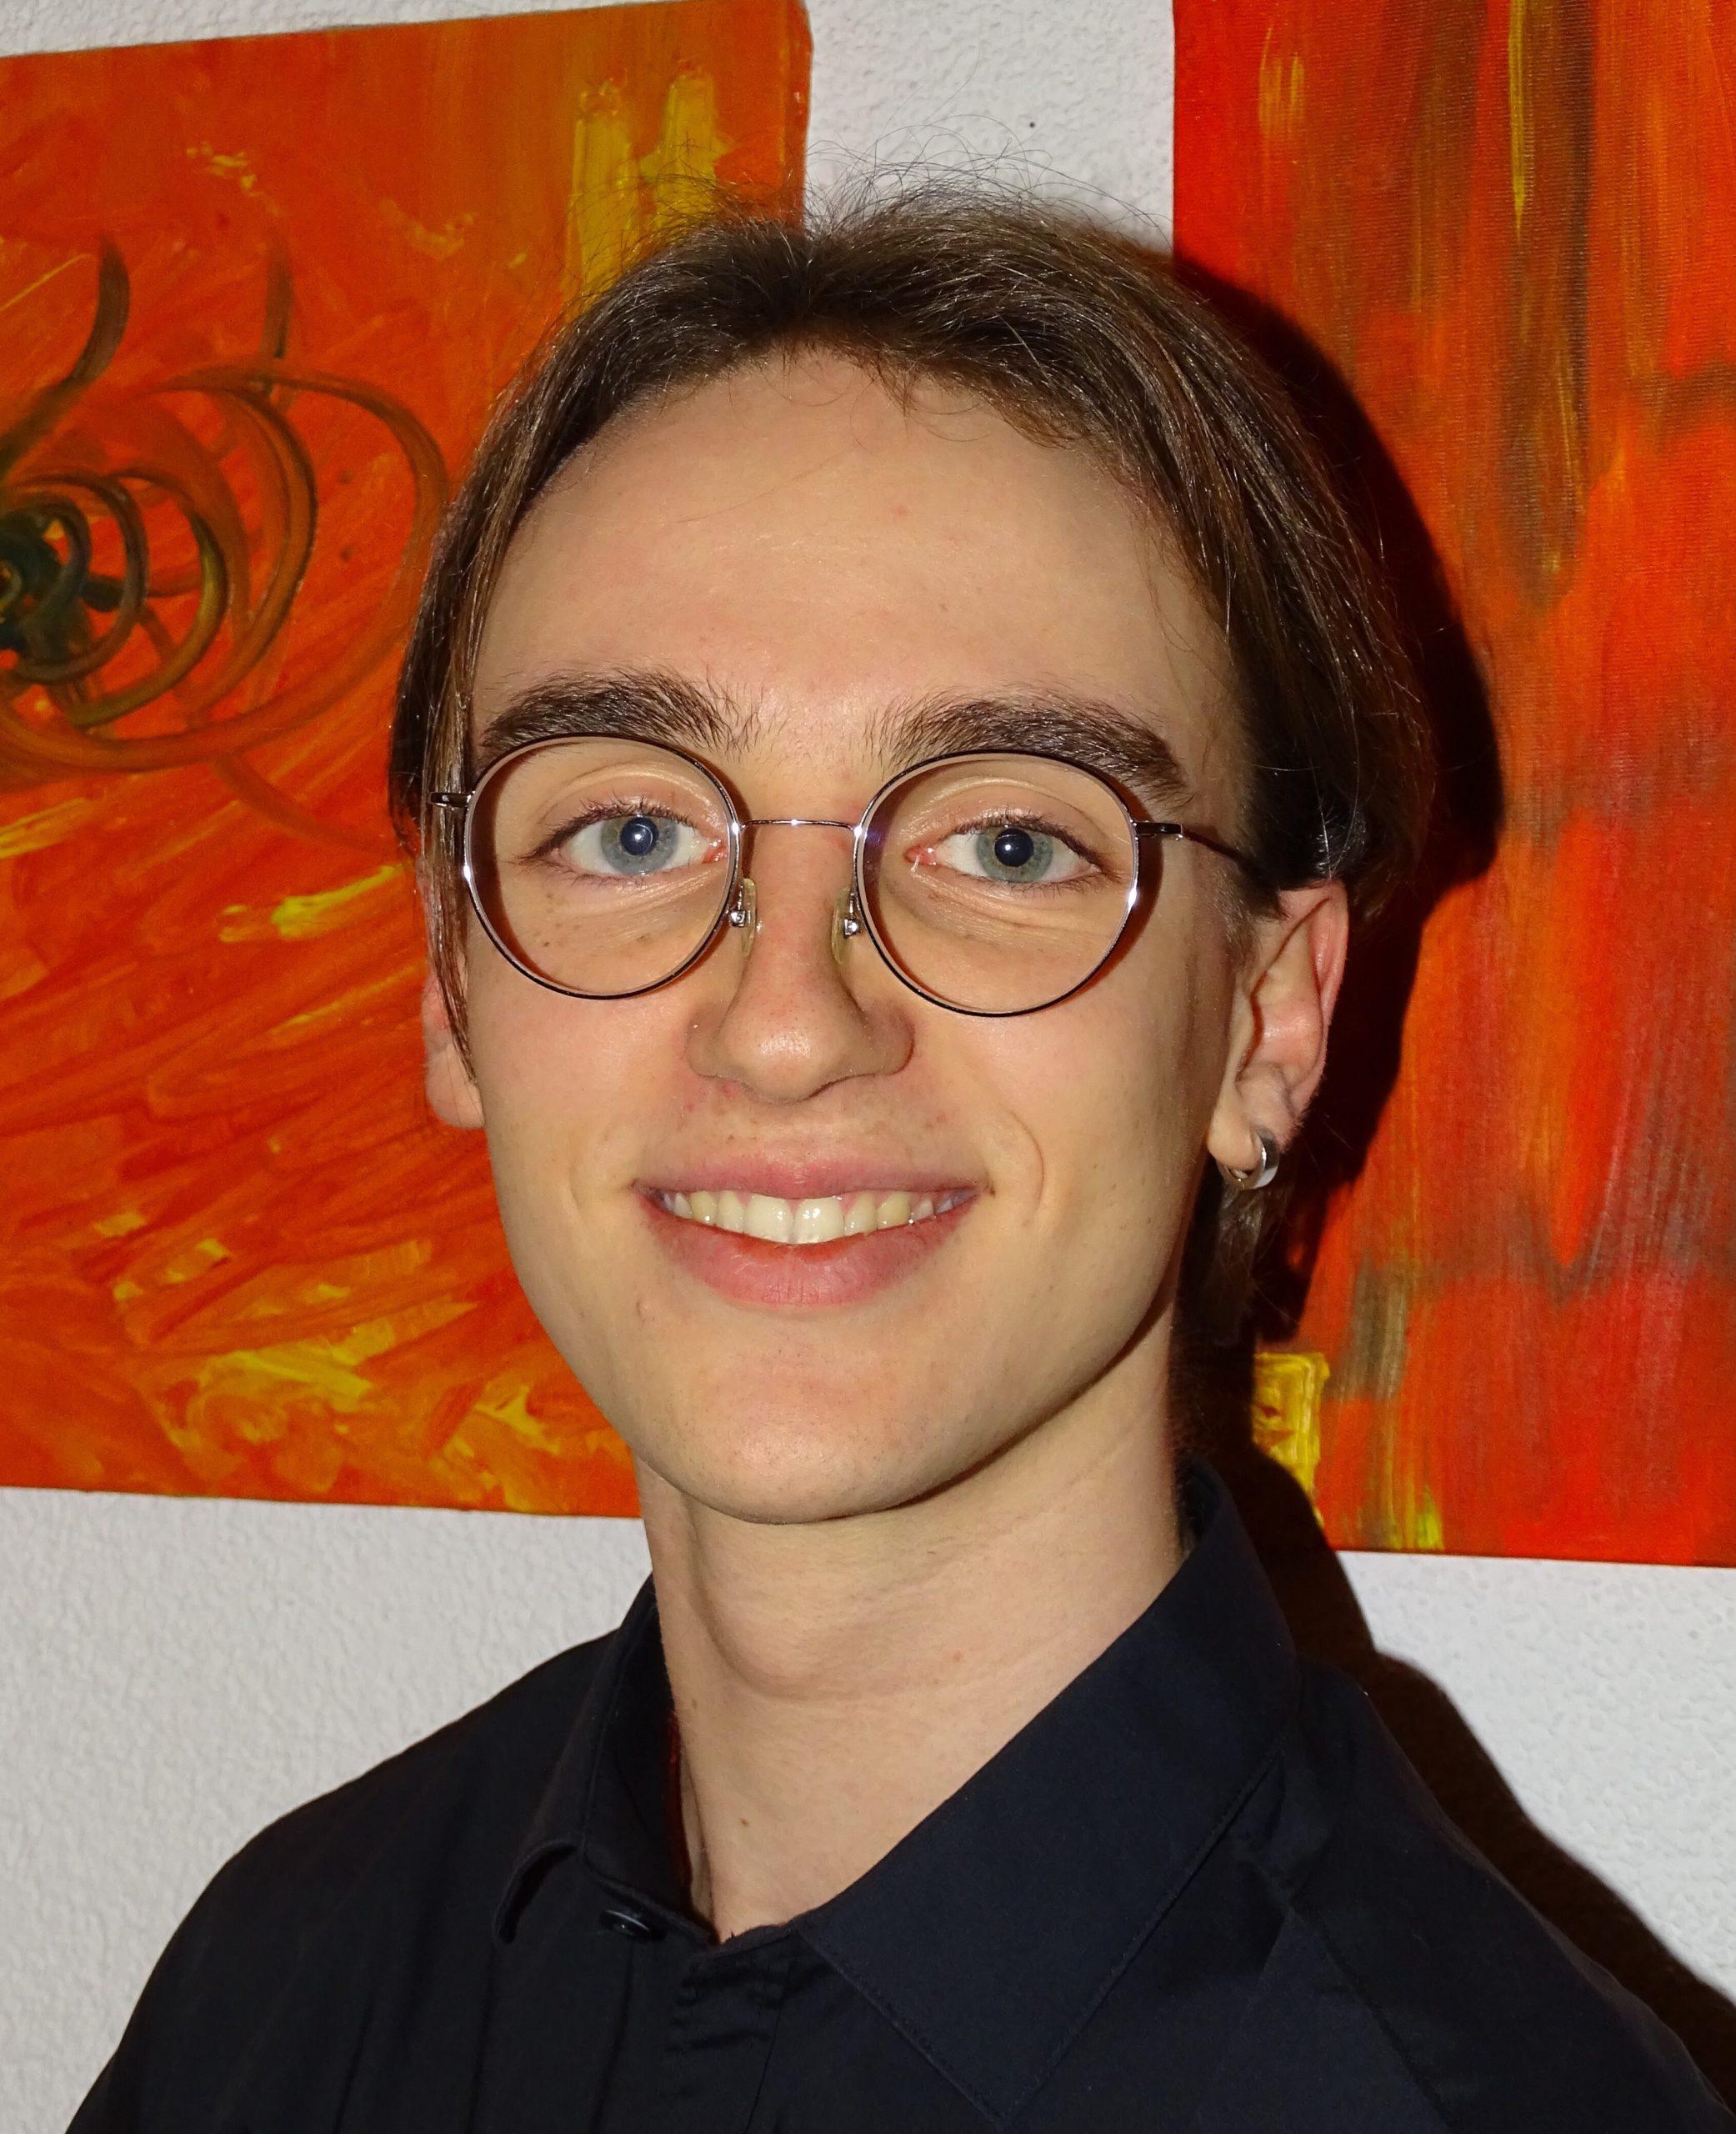 Yquem Zberg